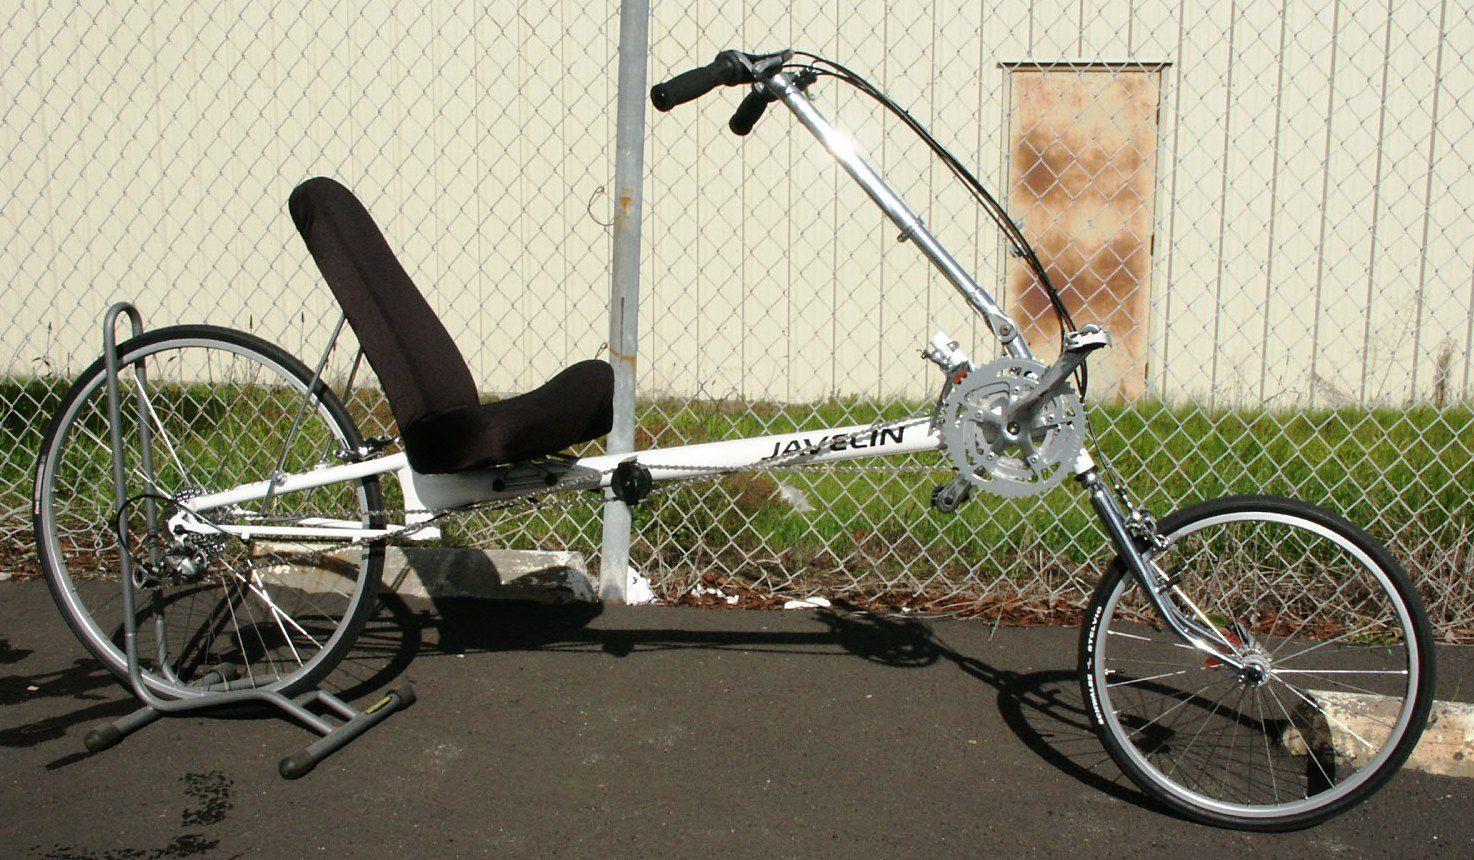 Easy Racers Javelin Model Recumbent Bicycle Javelin Bicycle